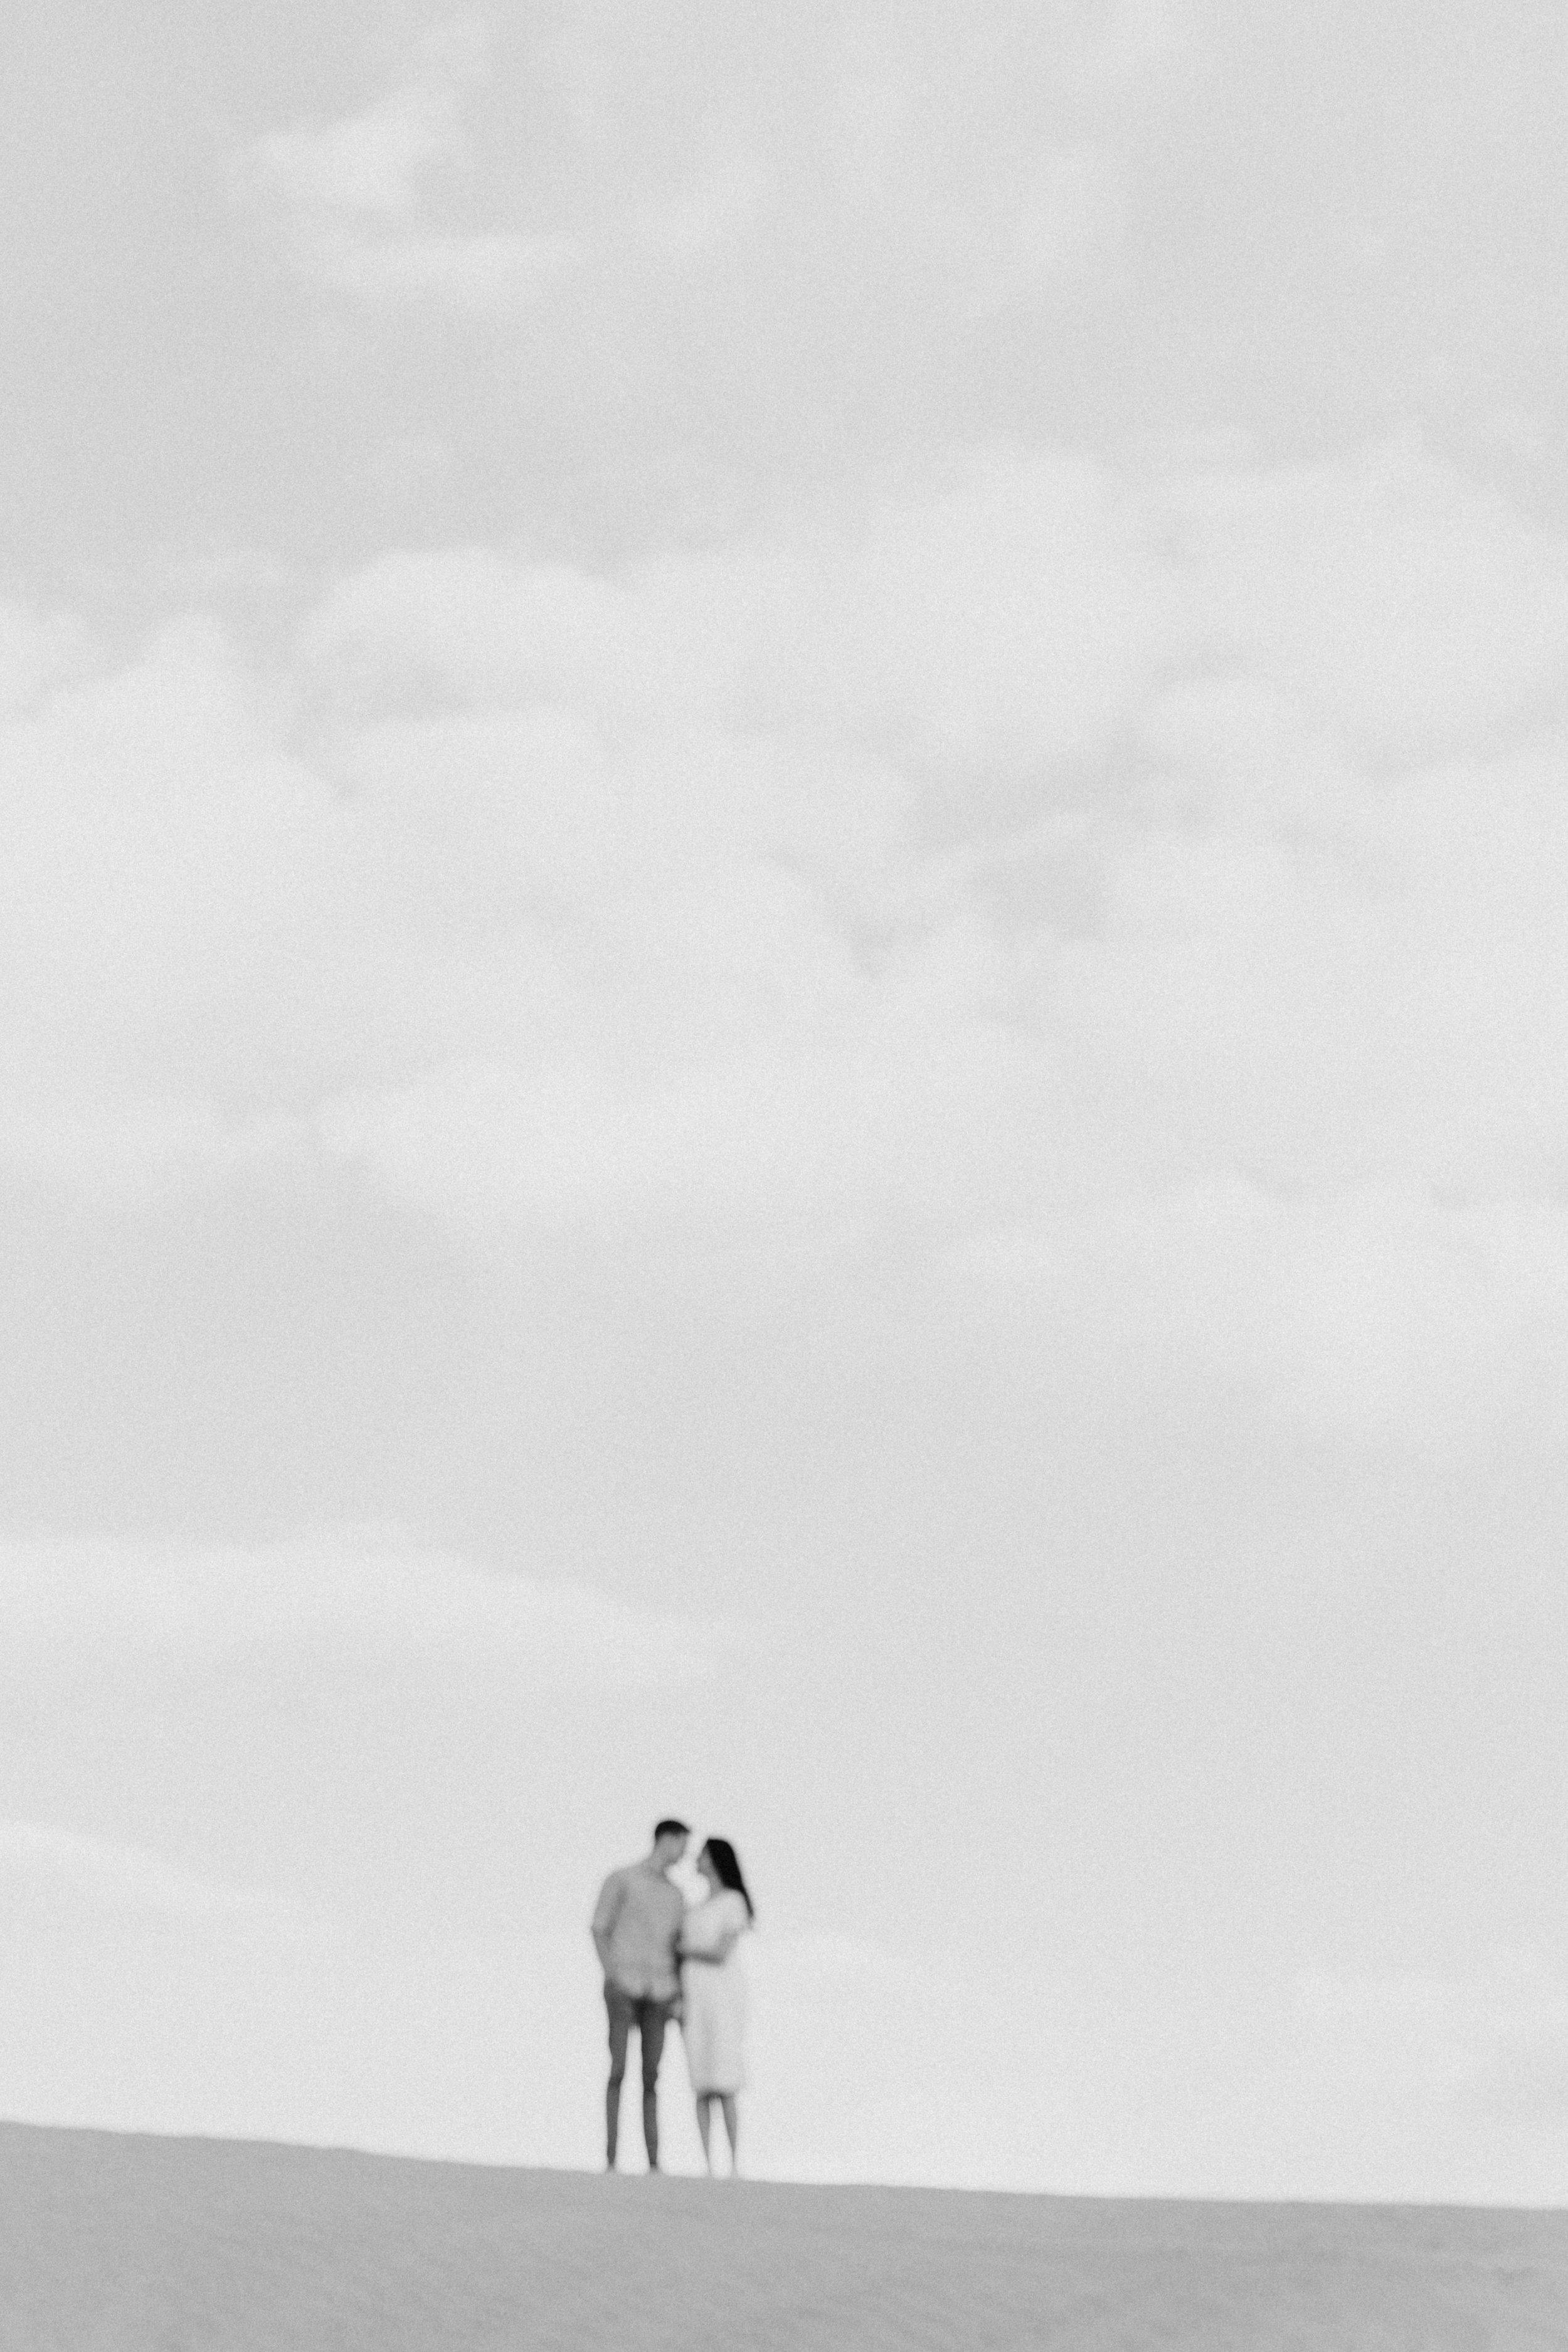 little-sahara-recreation-area-elopement-engagement-wedding-photography-michael-cozzens-10.jpg